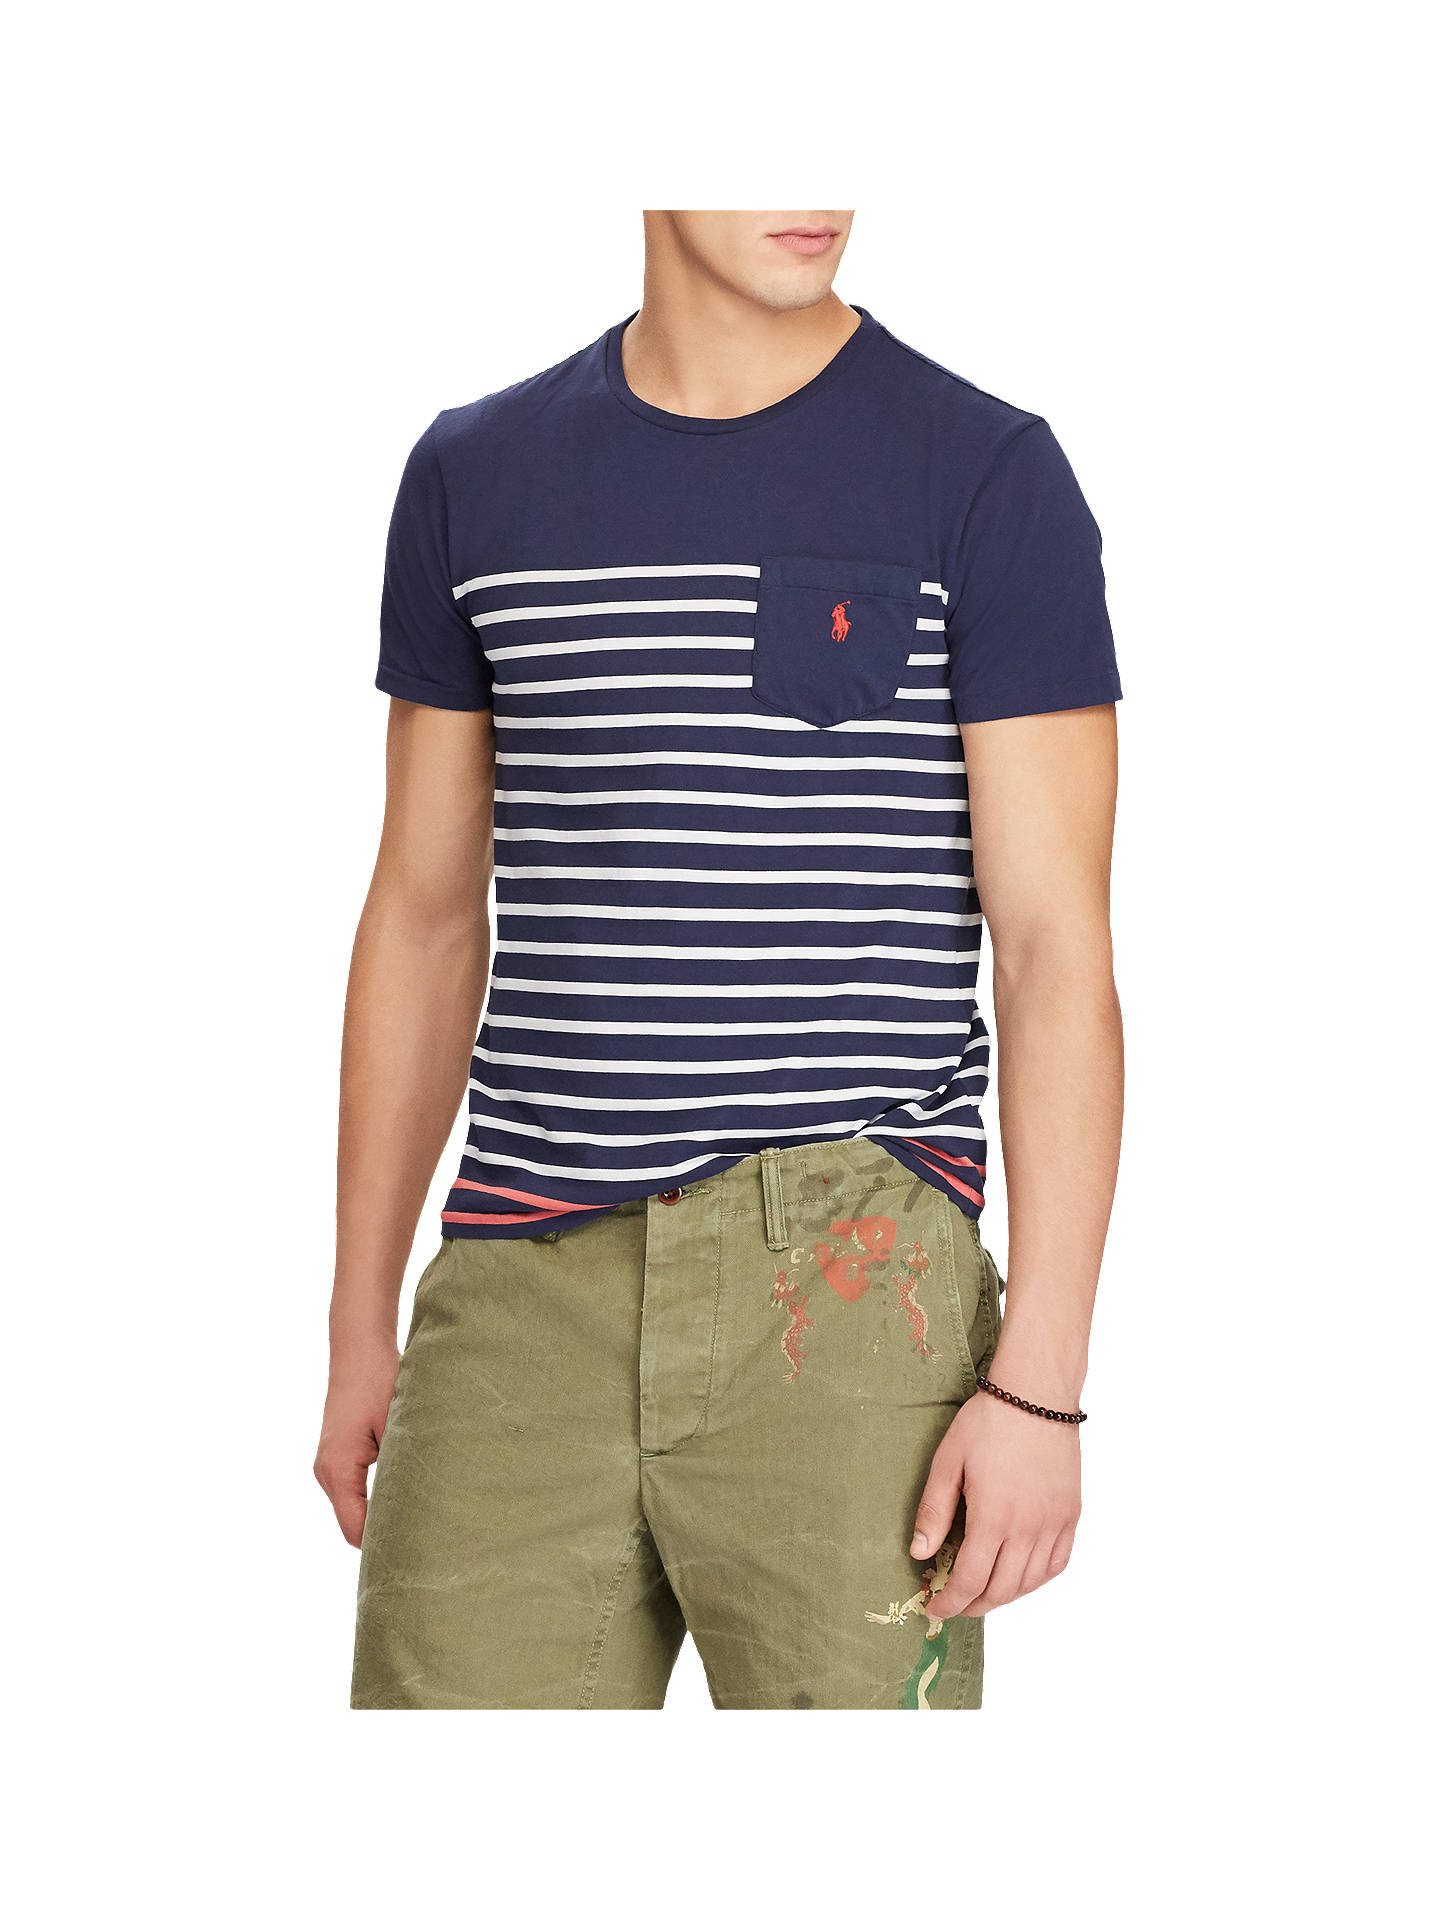 1c68abb0a Buy Polo Ralph Lauren Yarn Died Stripe Pocket T-Shirt, Newport Navy, S ...